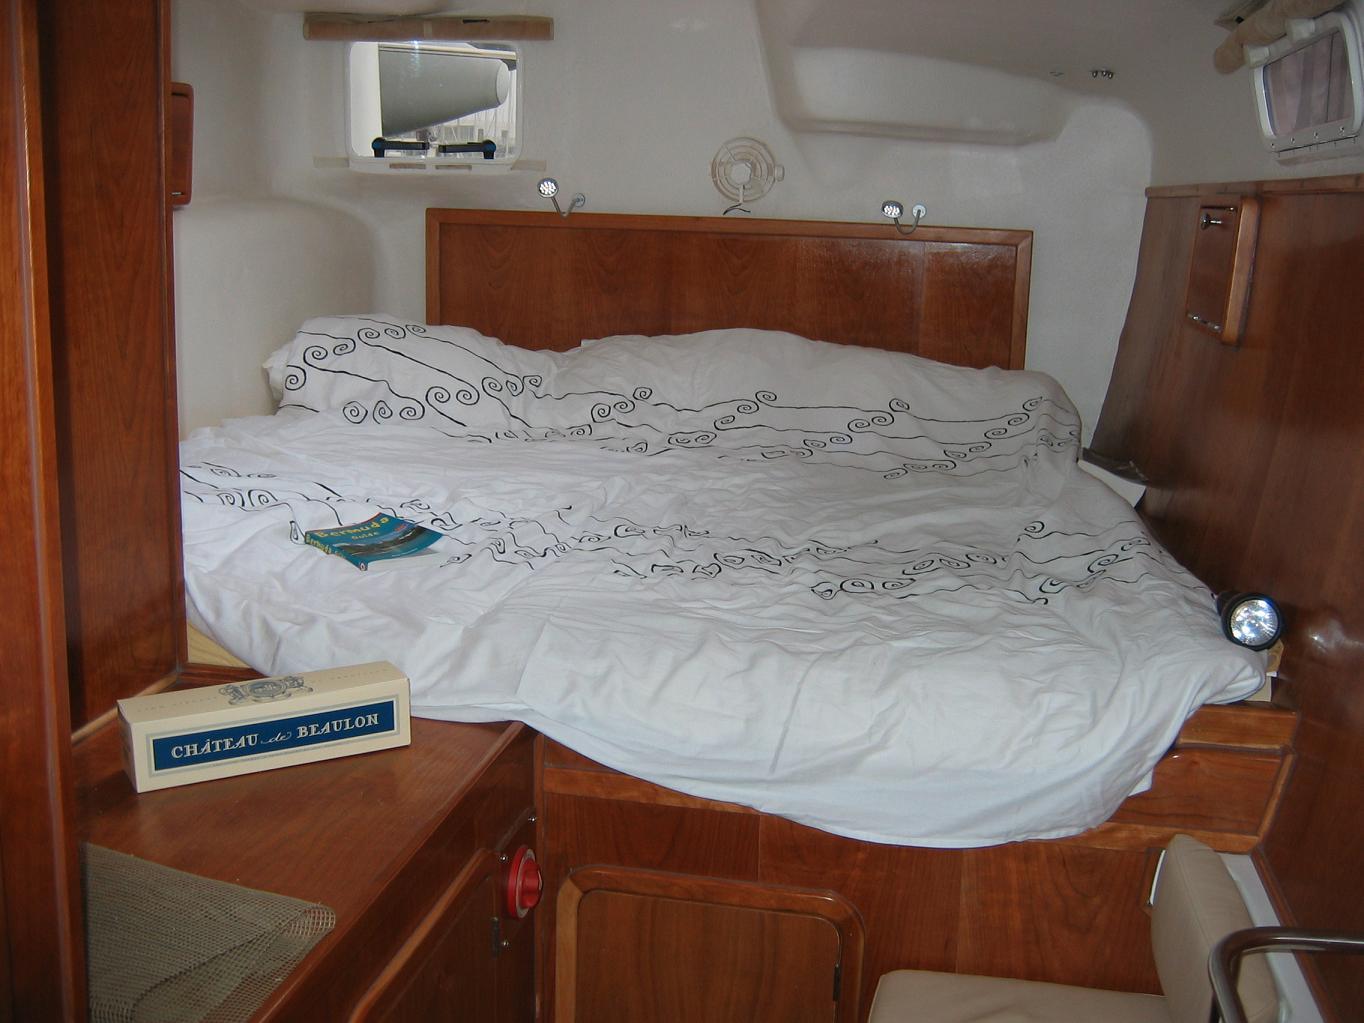 Click image for larger version  Name:Fast Cat 435-Les couchettes des cabines arri_re sont royales!kl.JPG Views:305 Size:139.5 KB ID:4740